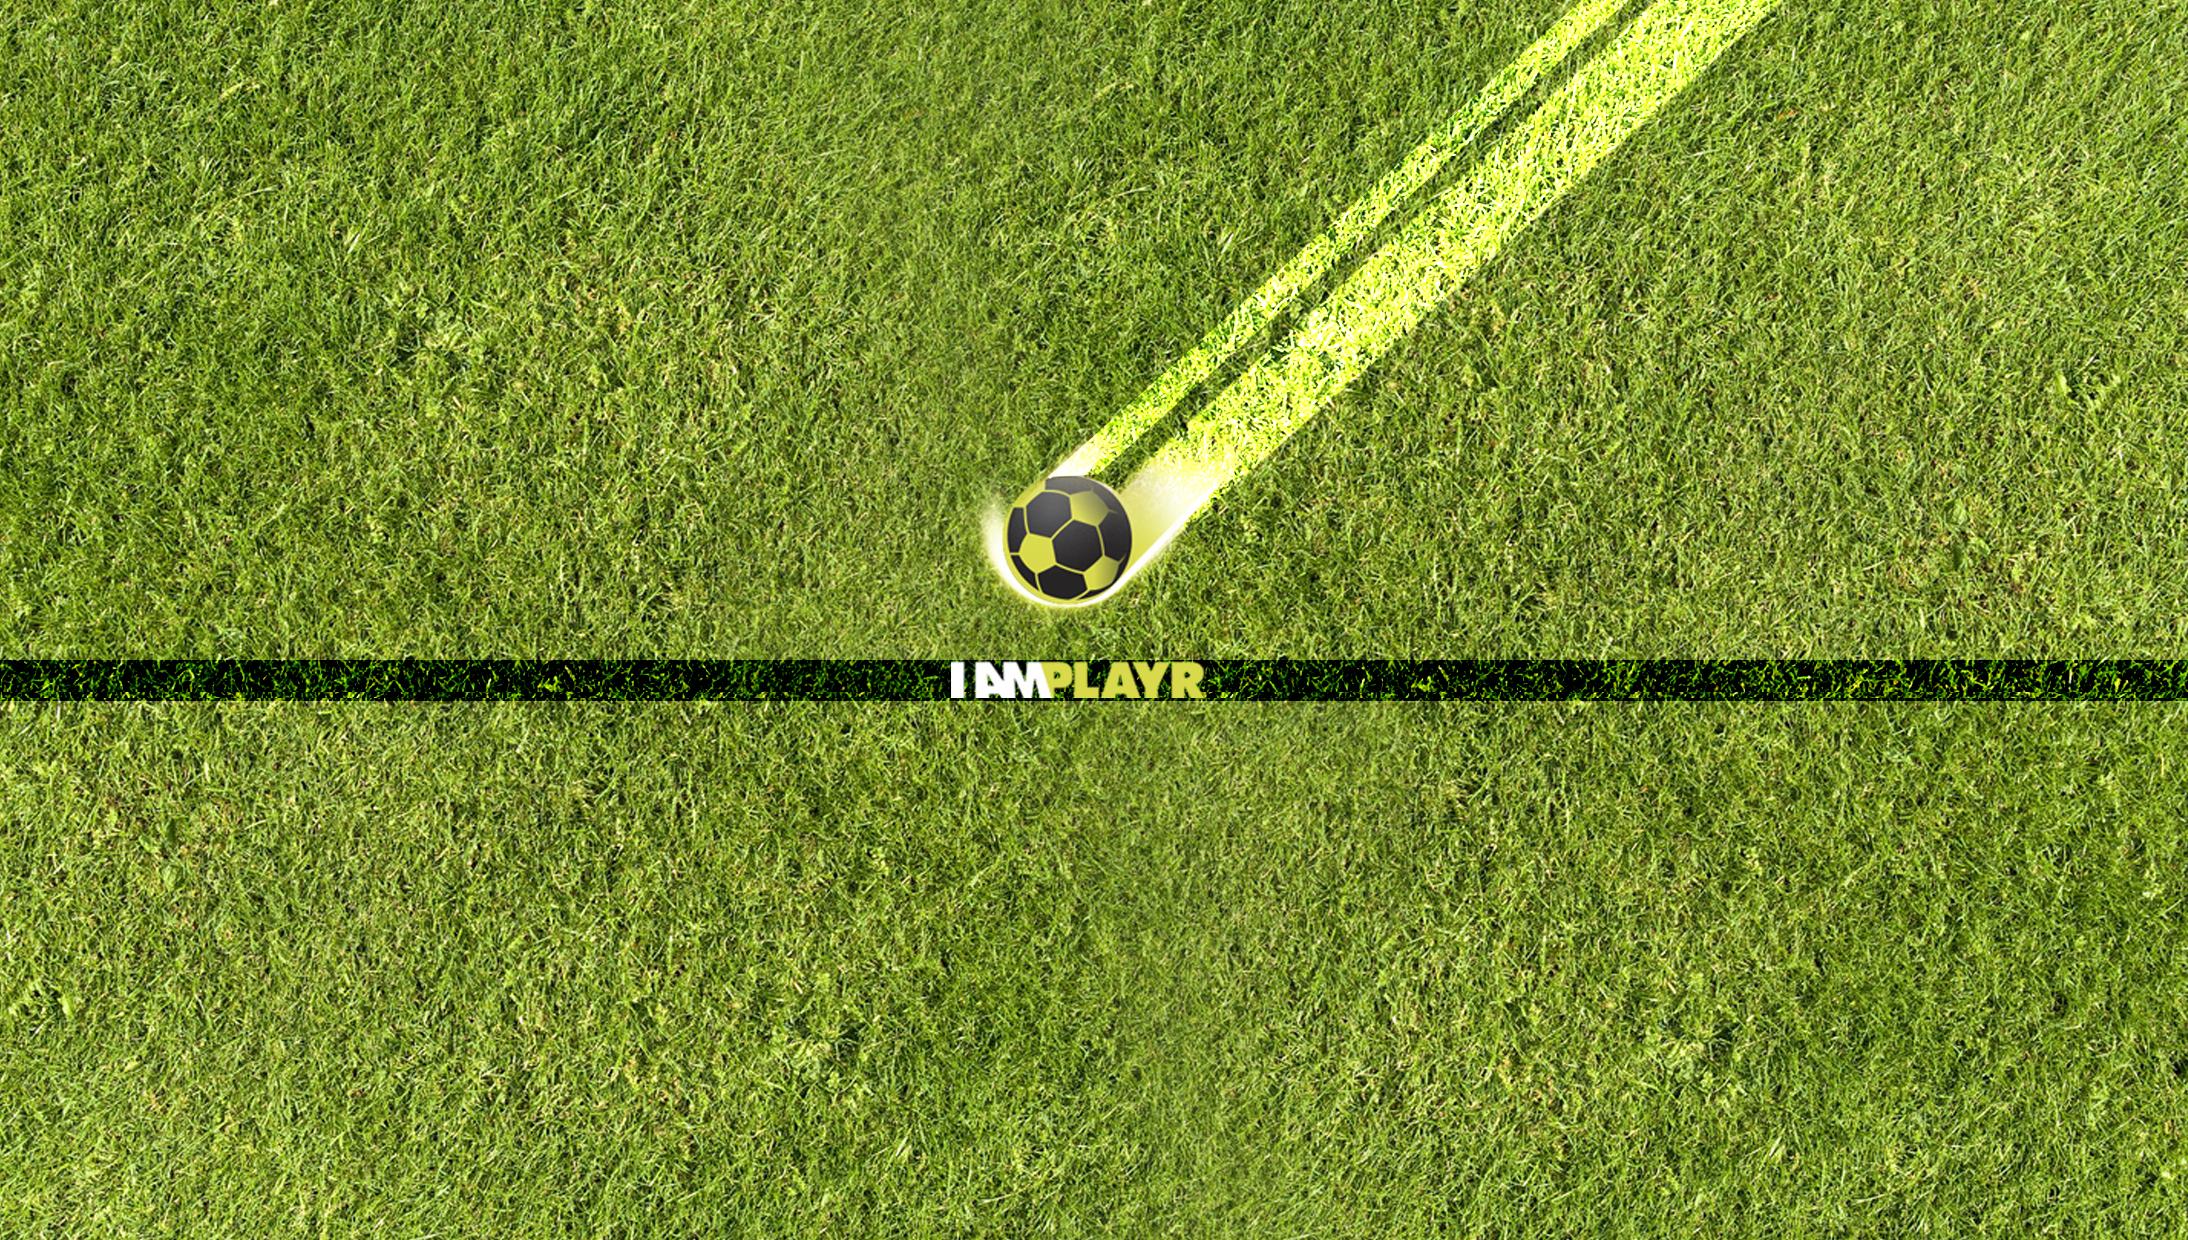 Soccer game presentation